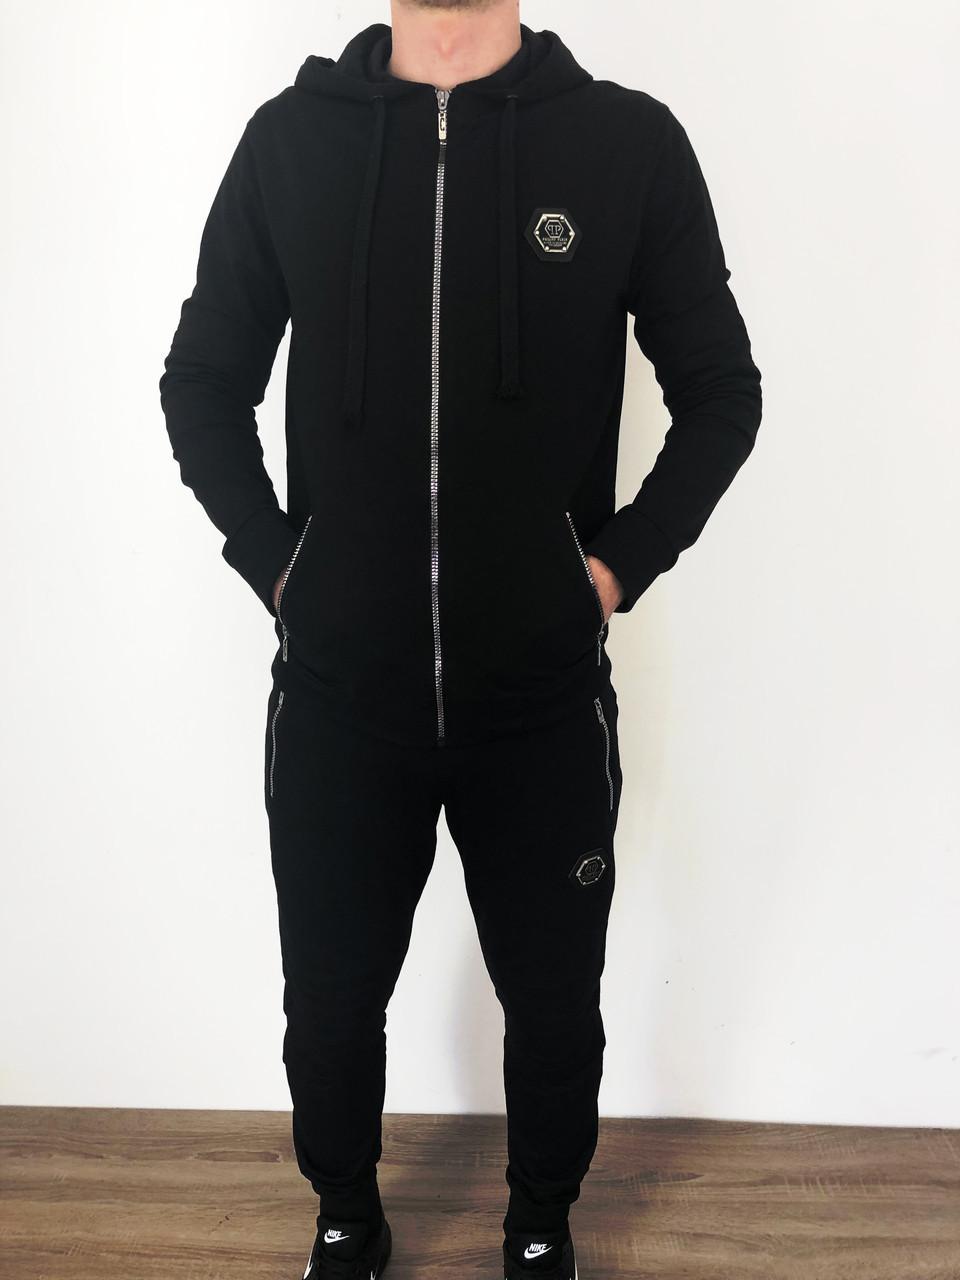 Спортивный мужской костюм Philipp Plein, филипп плейн